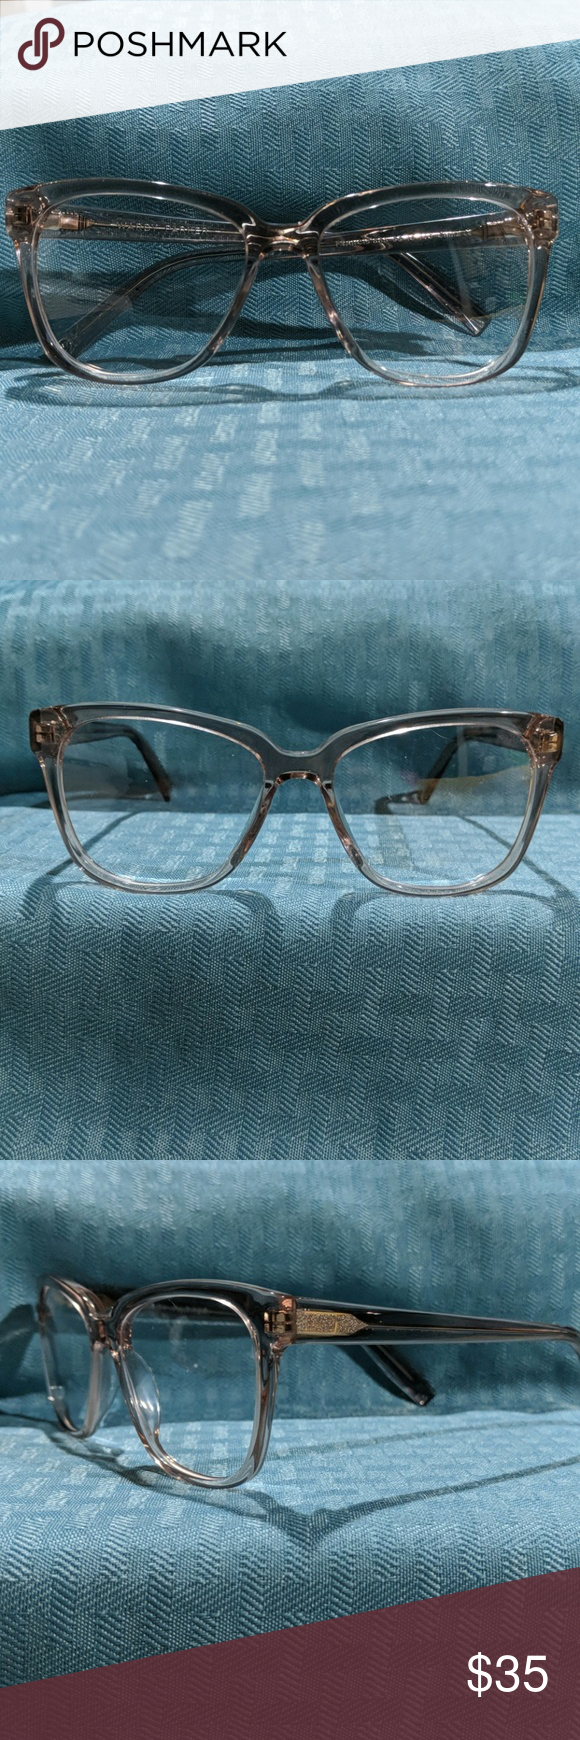 Warby Parker frames Warby Parker Francis rose water frames